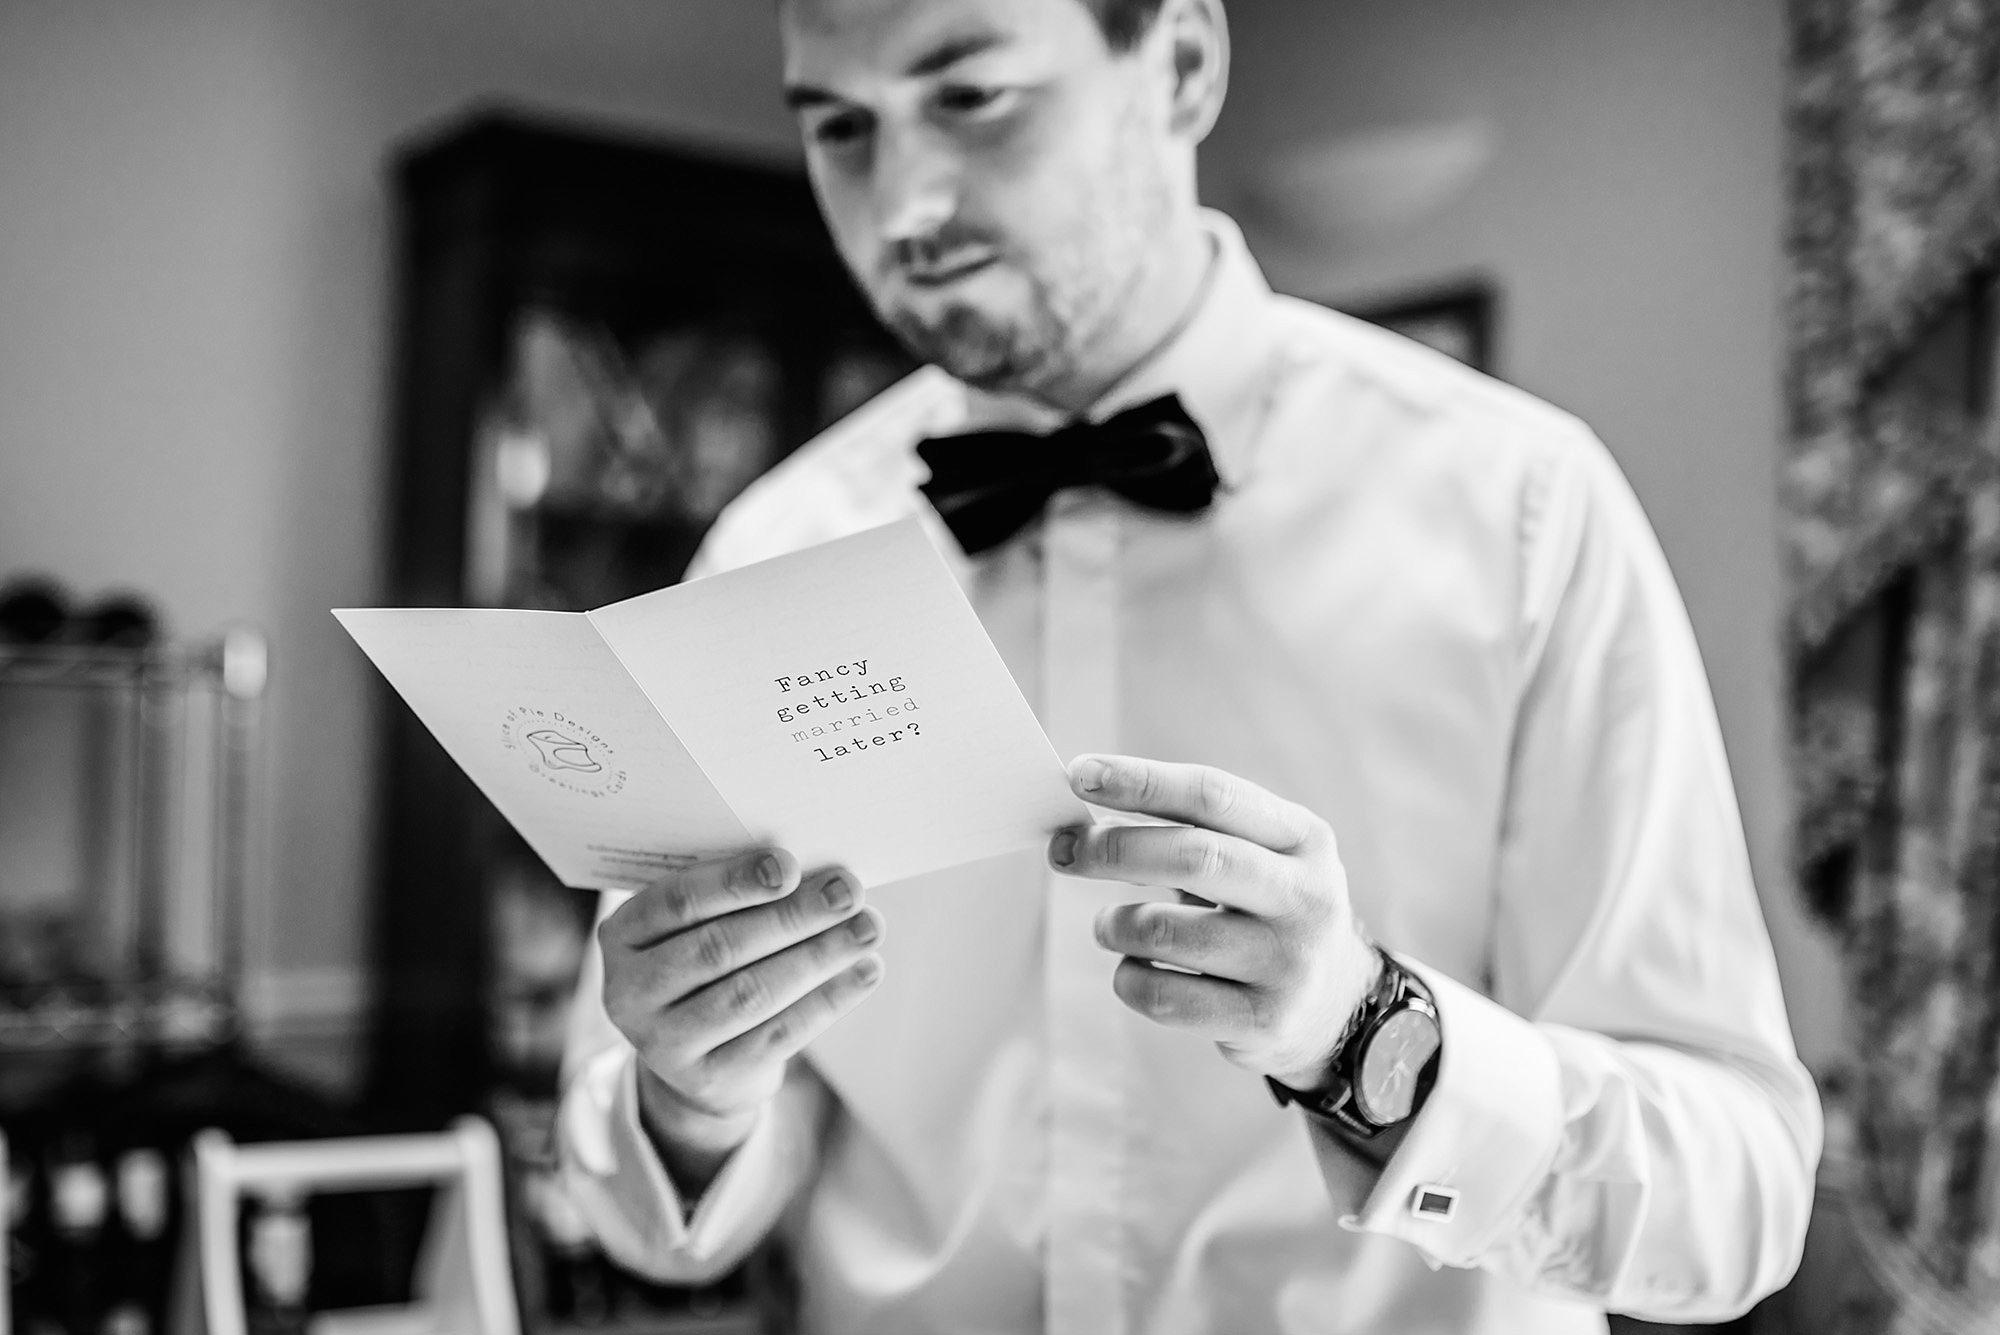 Fun London Wedding groom reads a card from bride